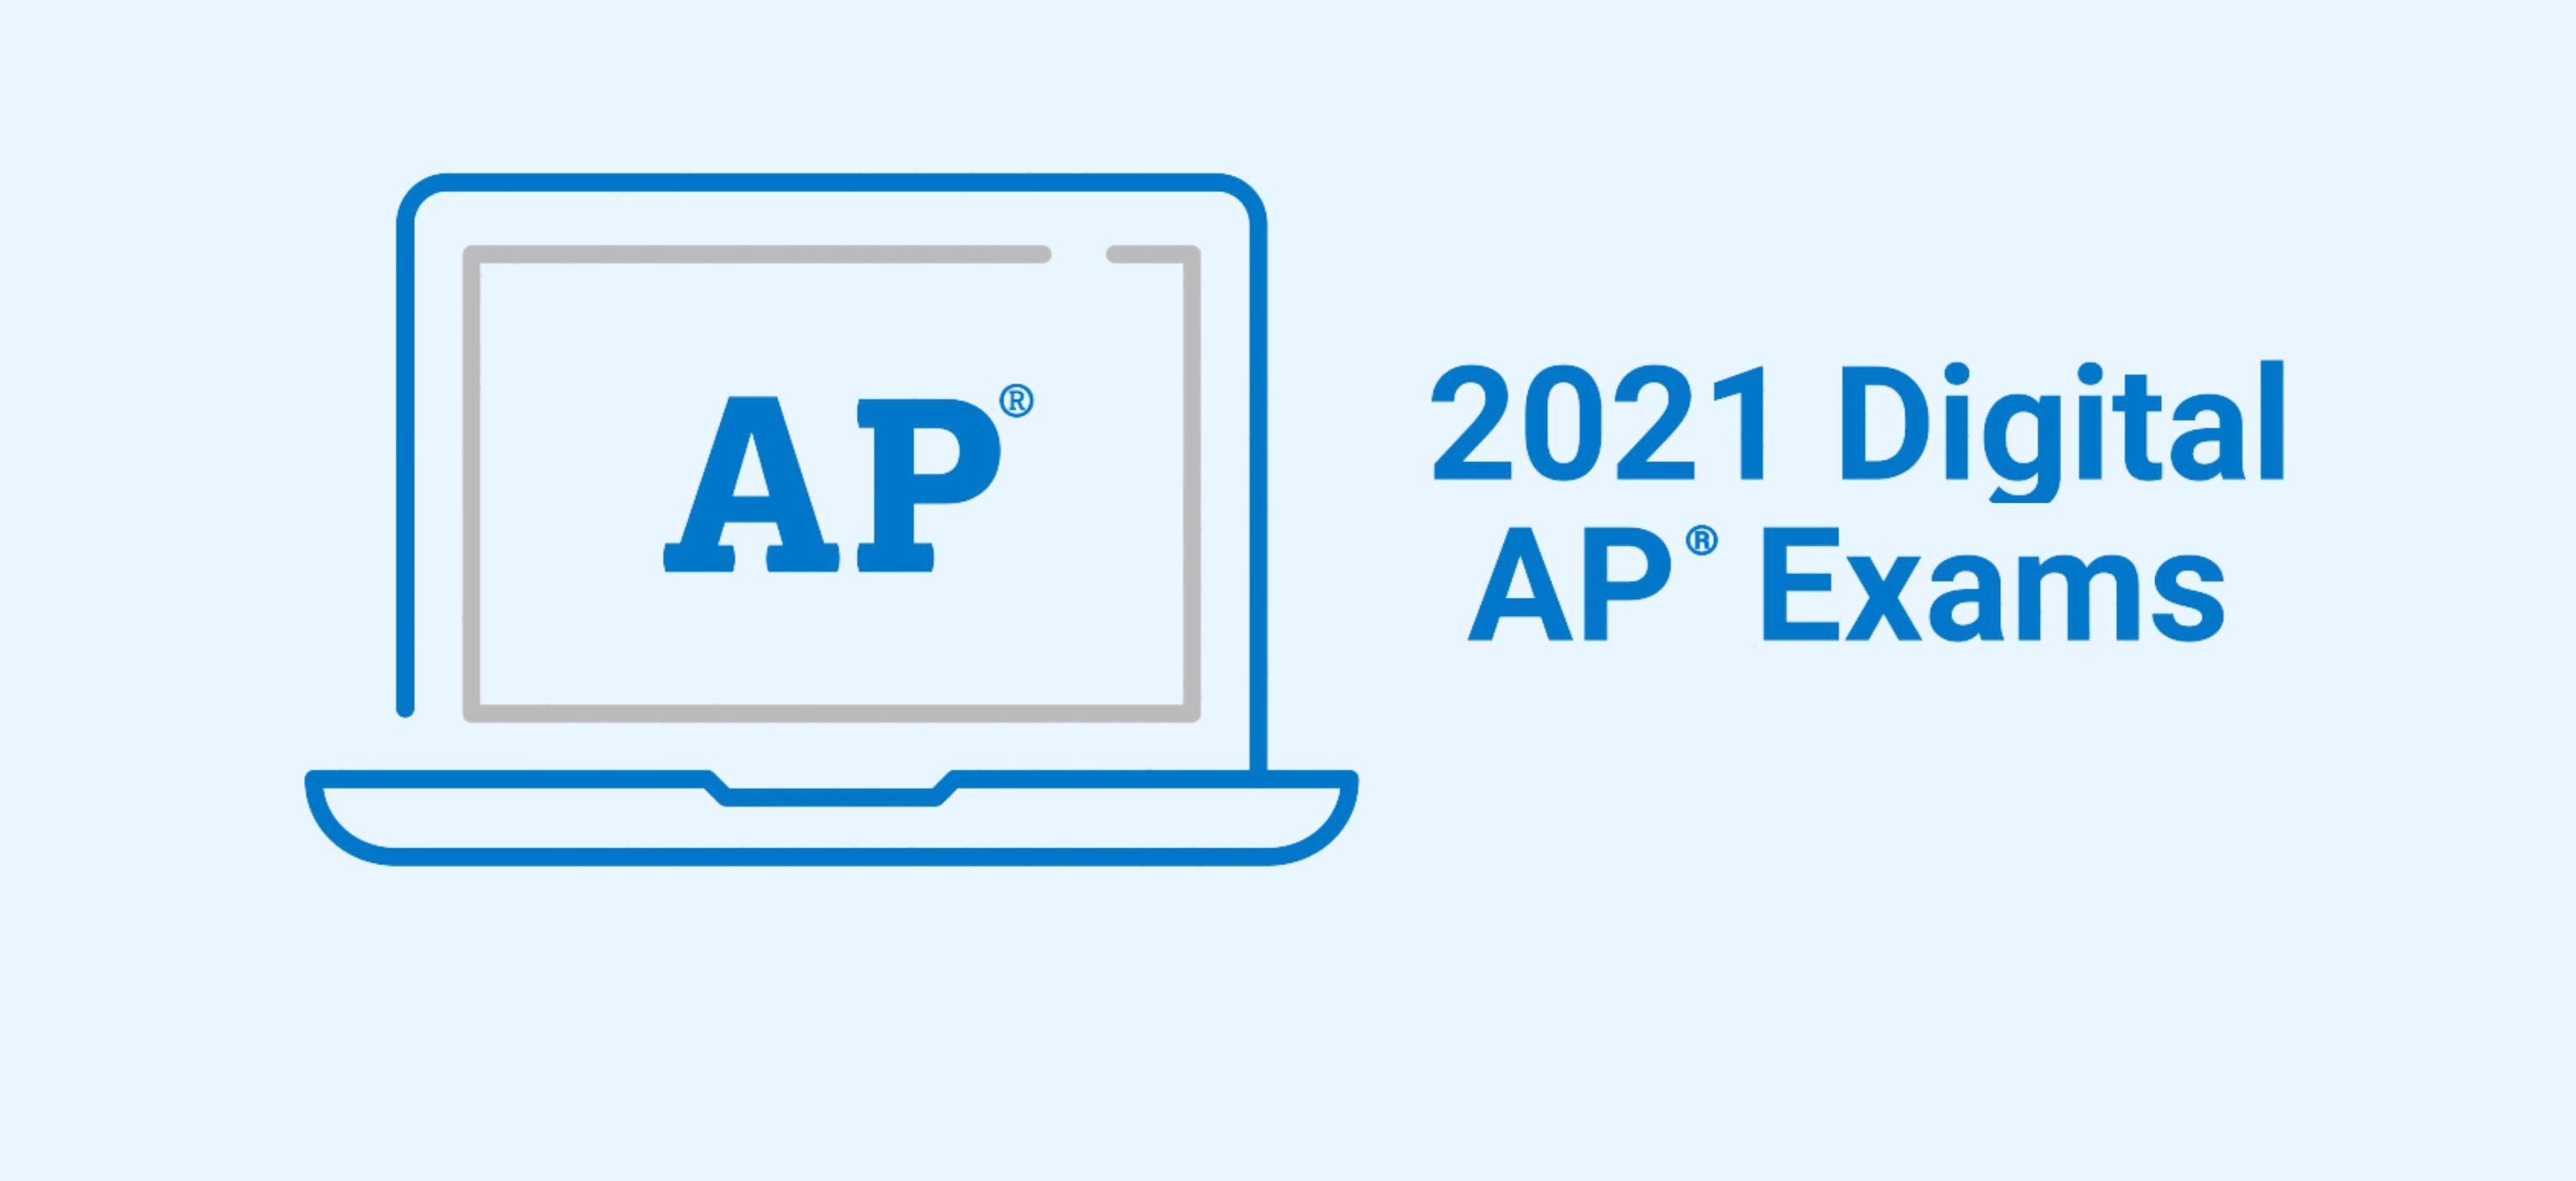 Install the AP Exam App Today!